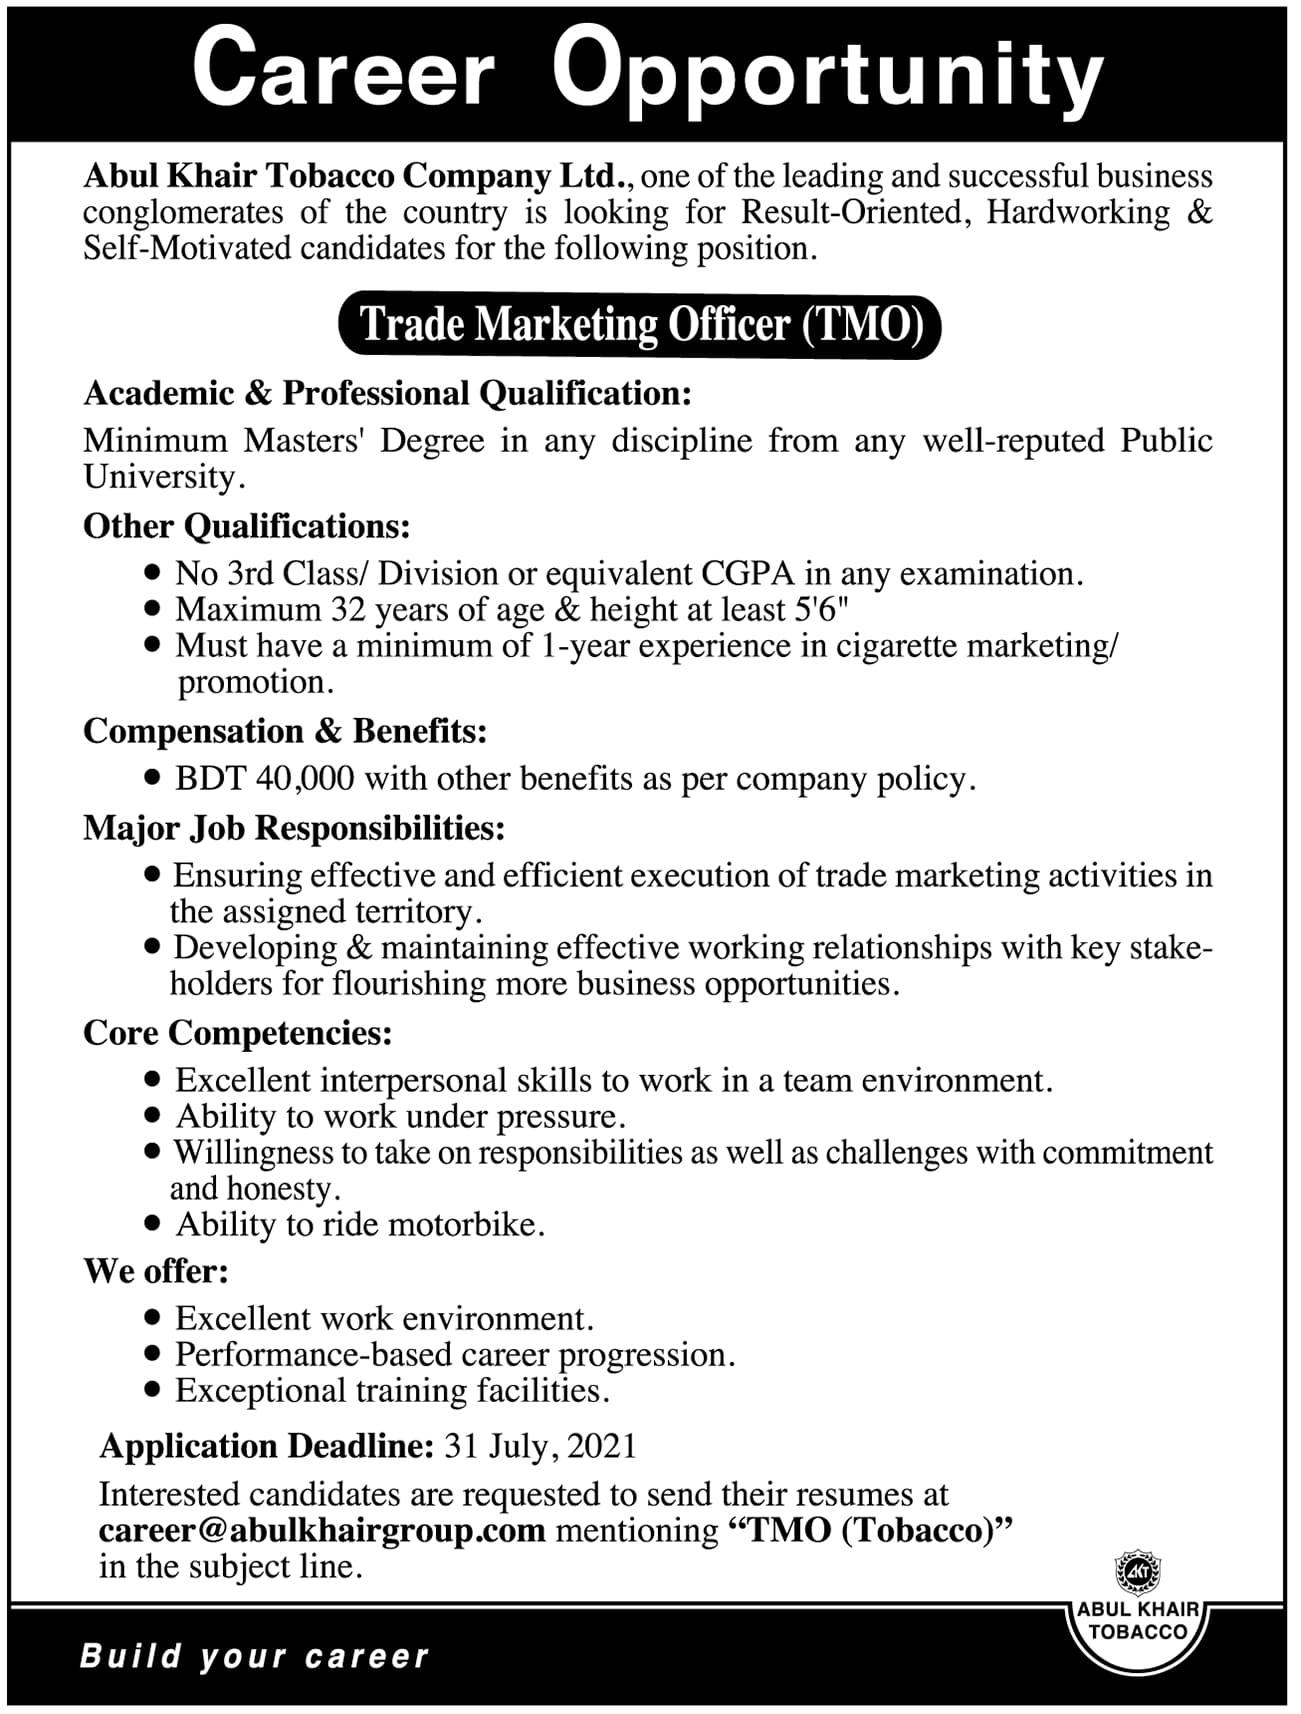 Abul Khair Tobacco Job Circular 2021